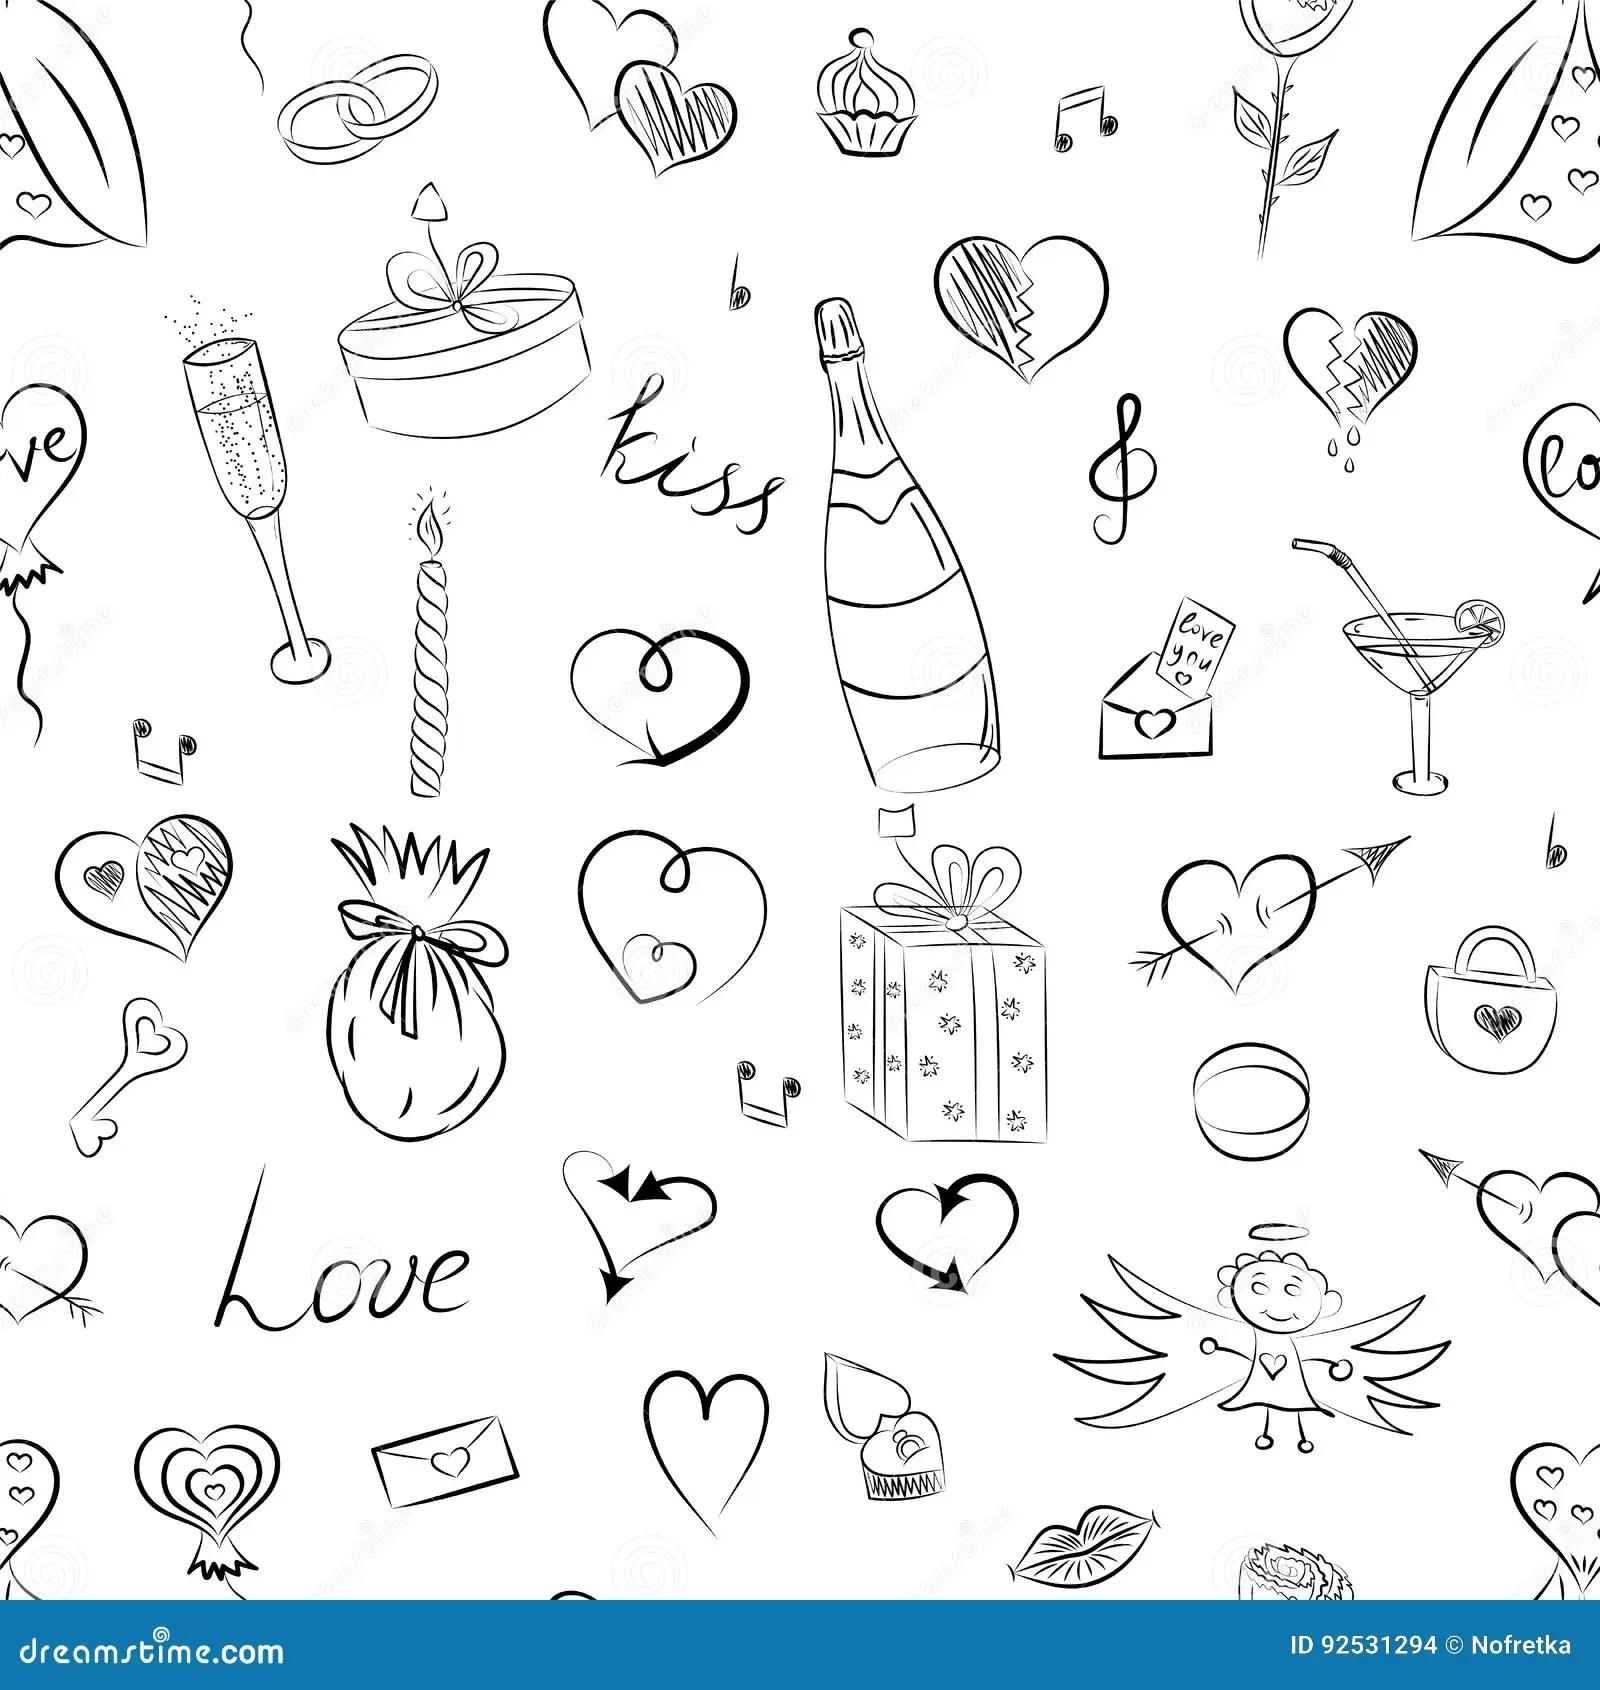 Drawings Of Symbols